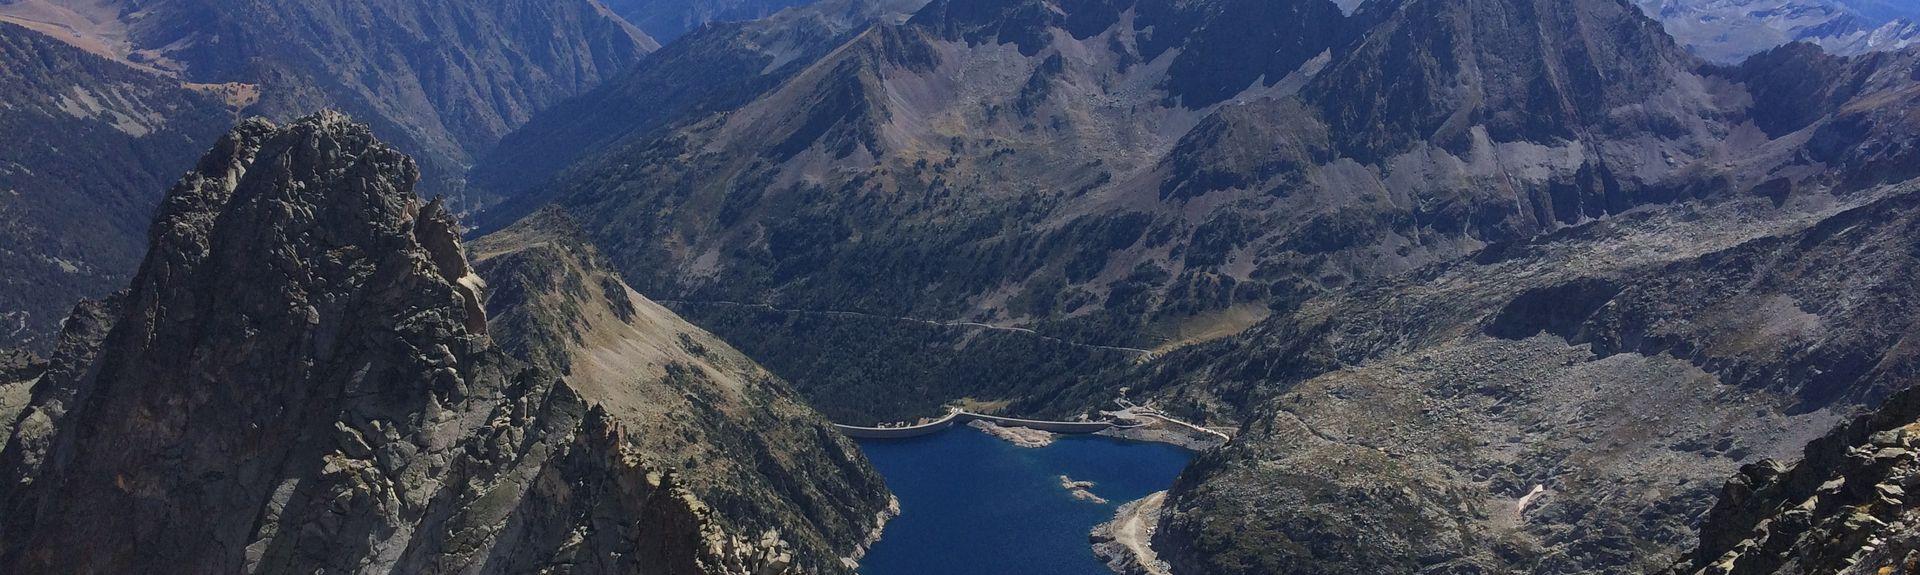 Arreau, Hautes-Pyrenees, France